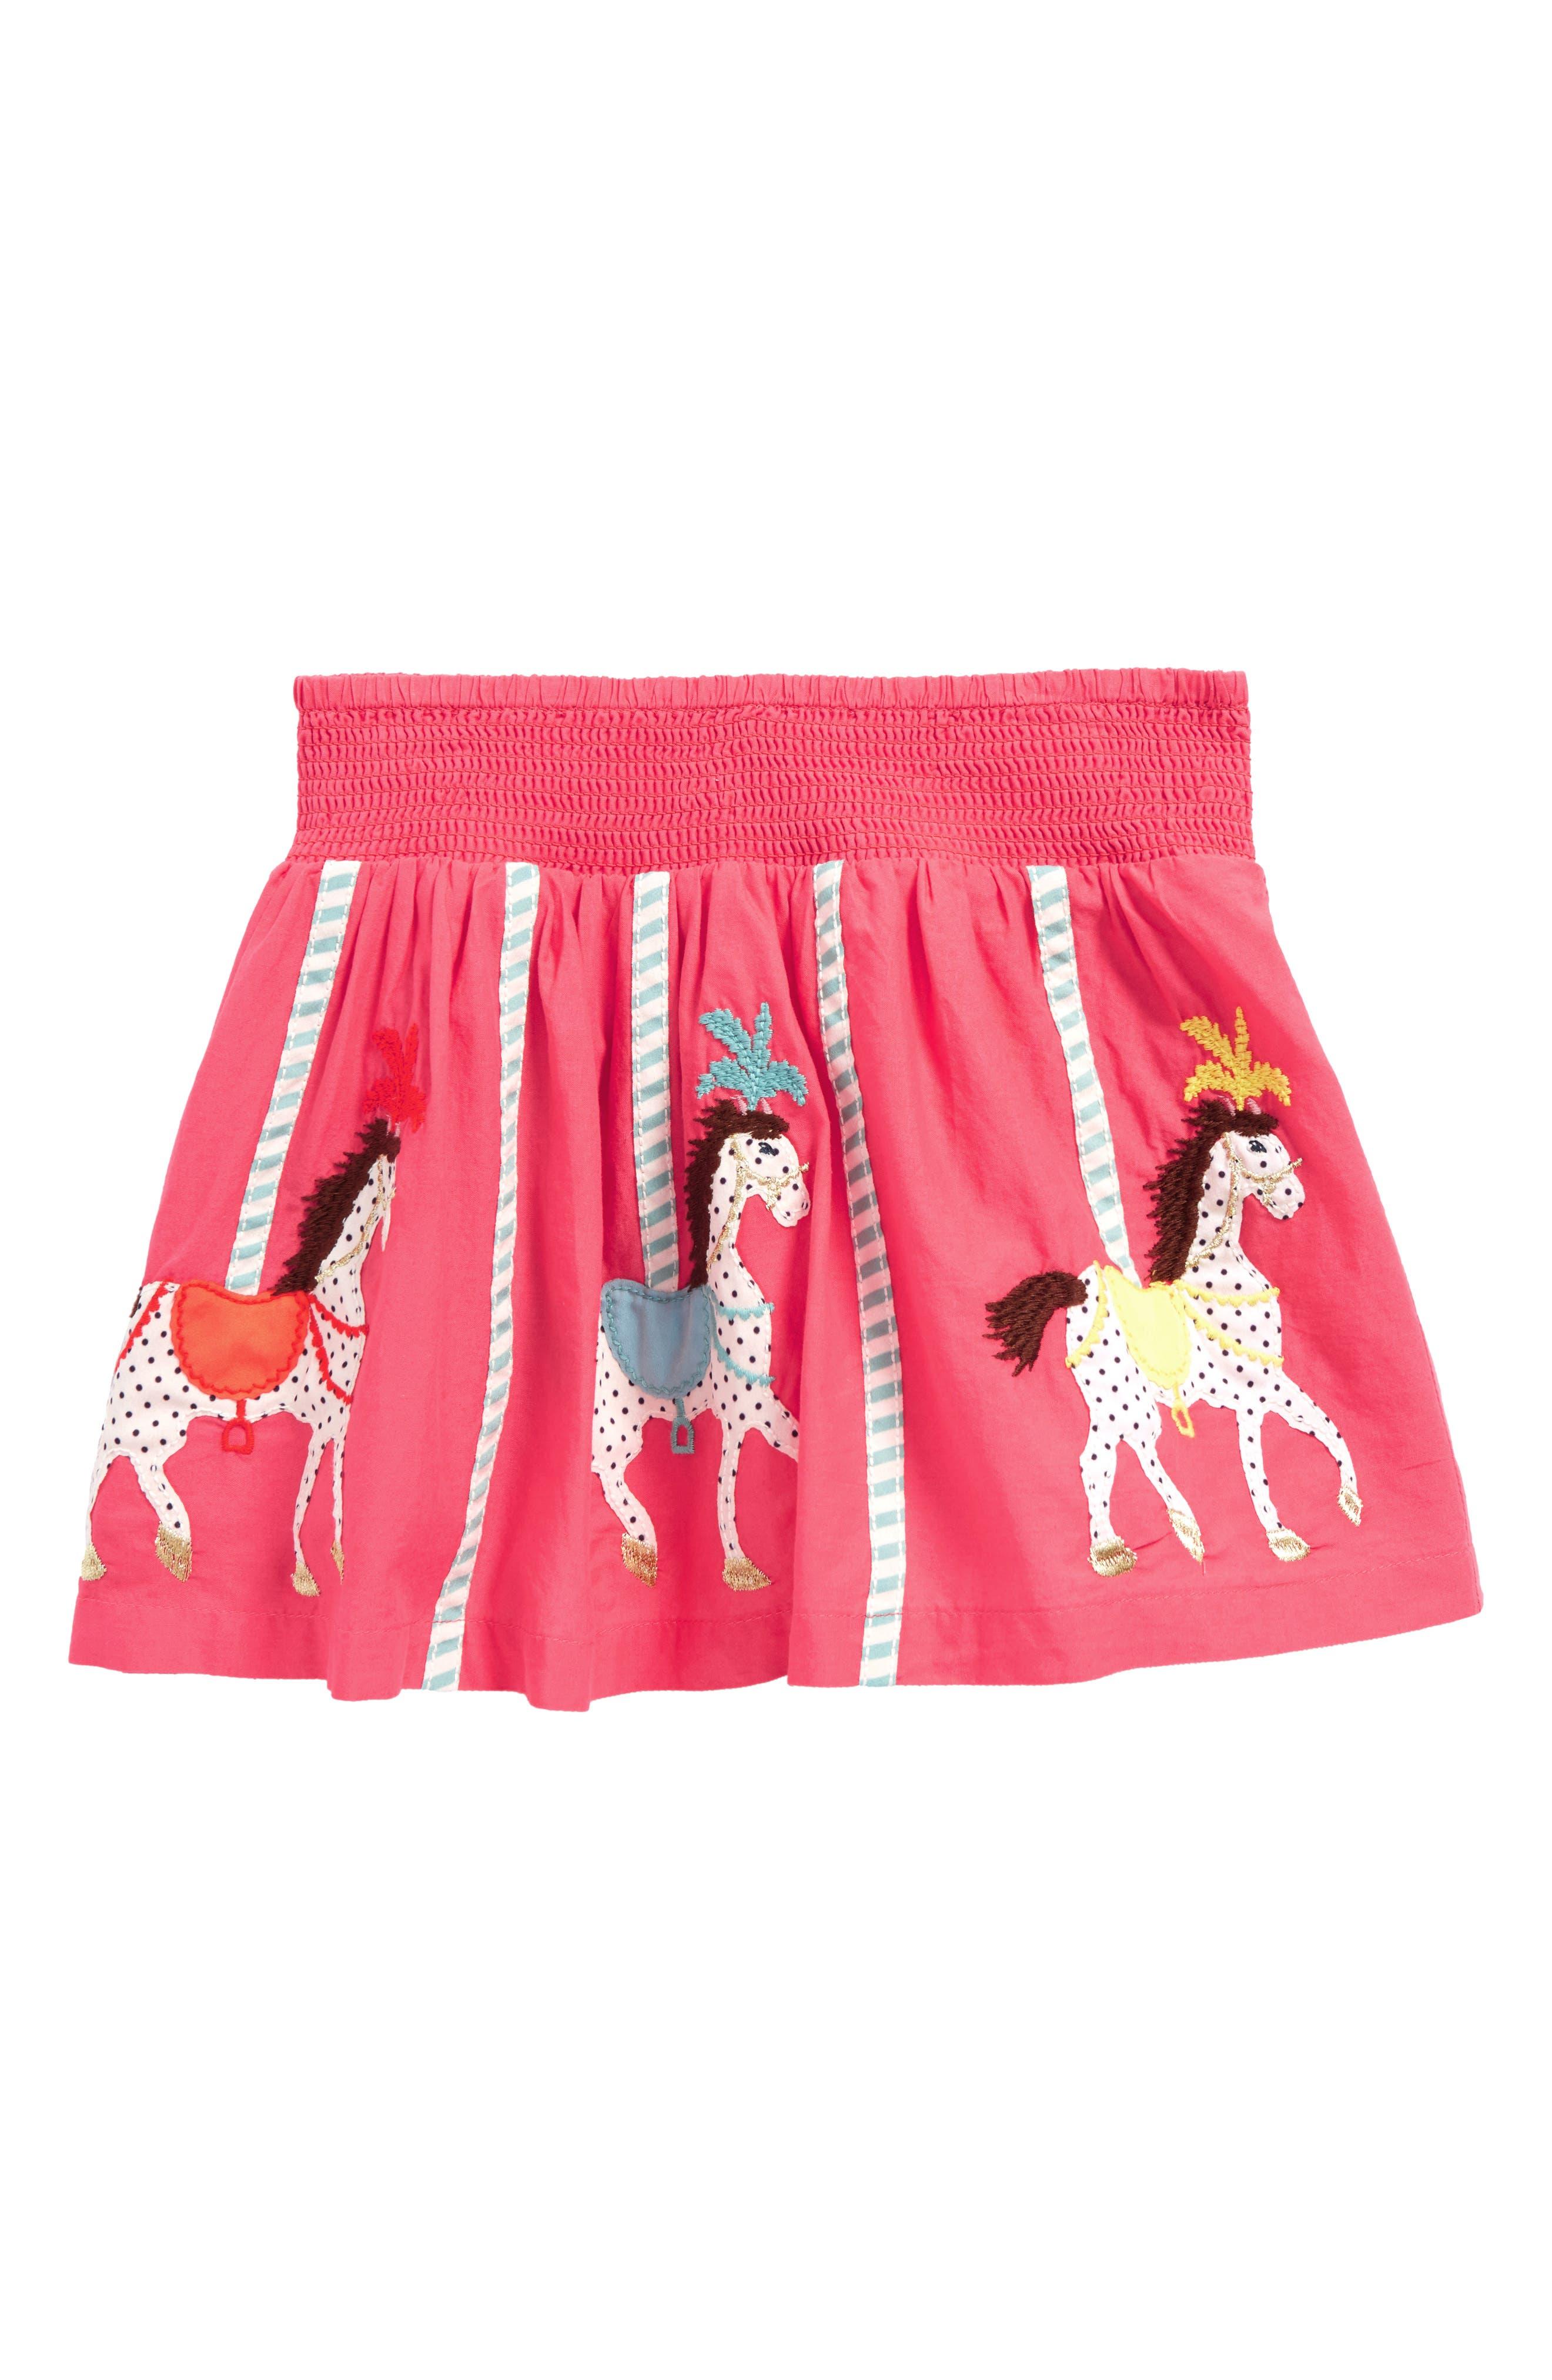 Colorful Appliqué Skirt,                         Main,                         color, Provence Dusty Pink Horses Pnk